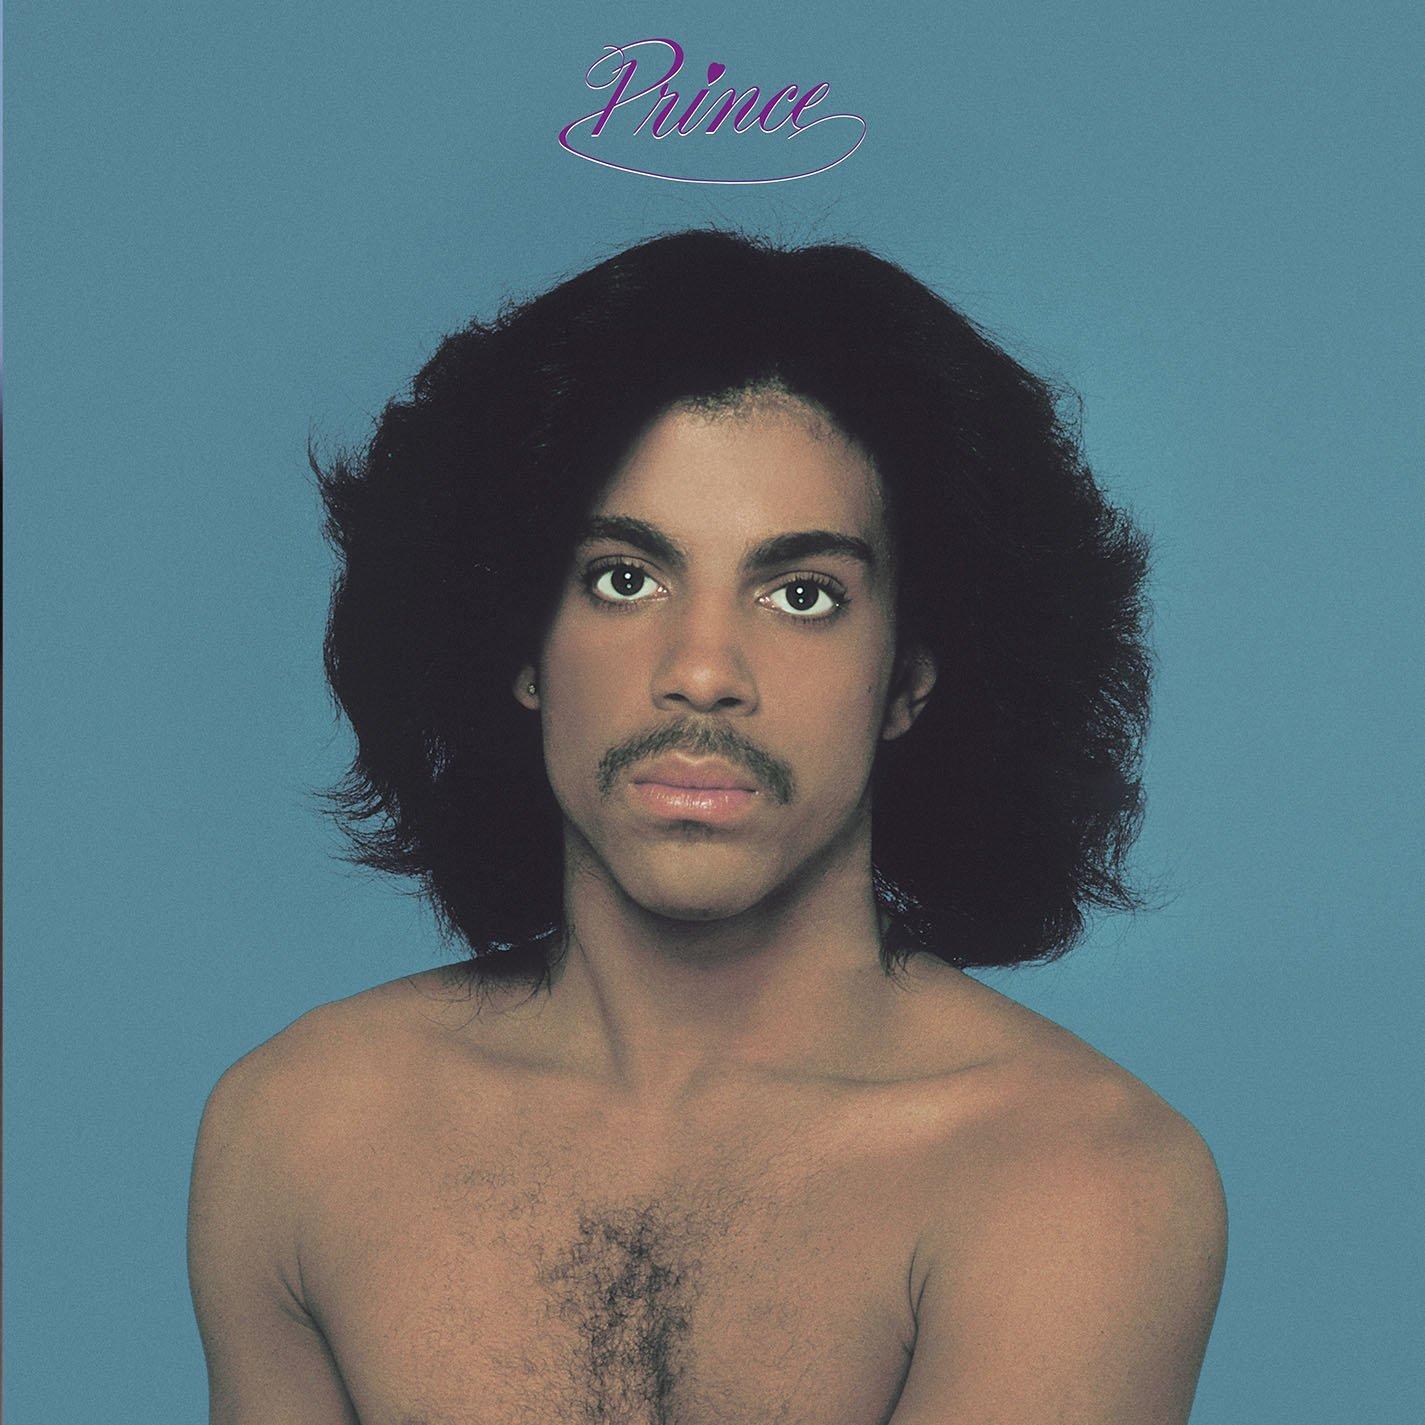 Prince sexy dancer live